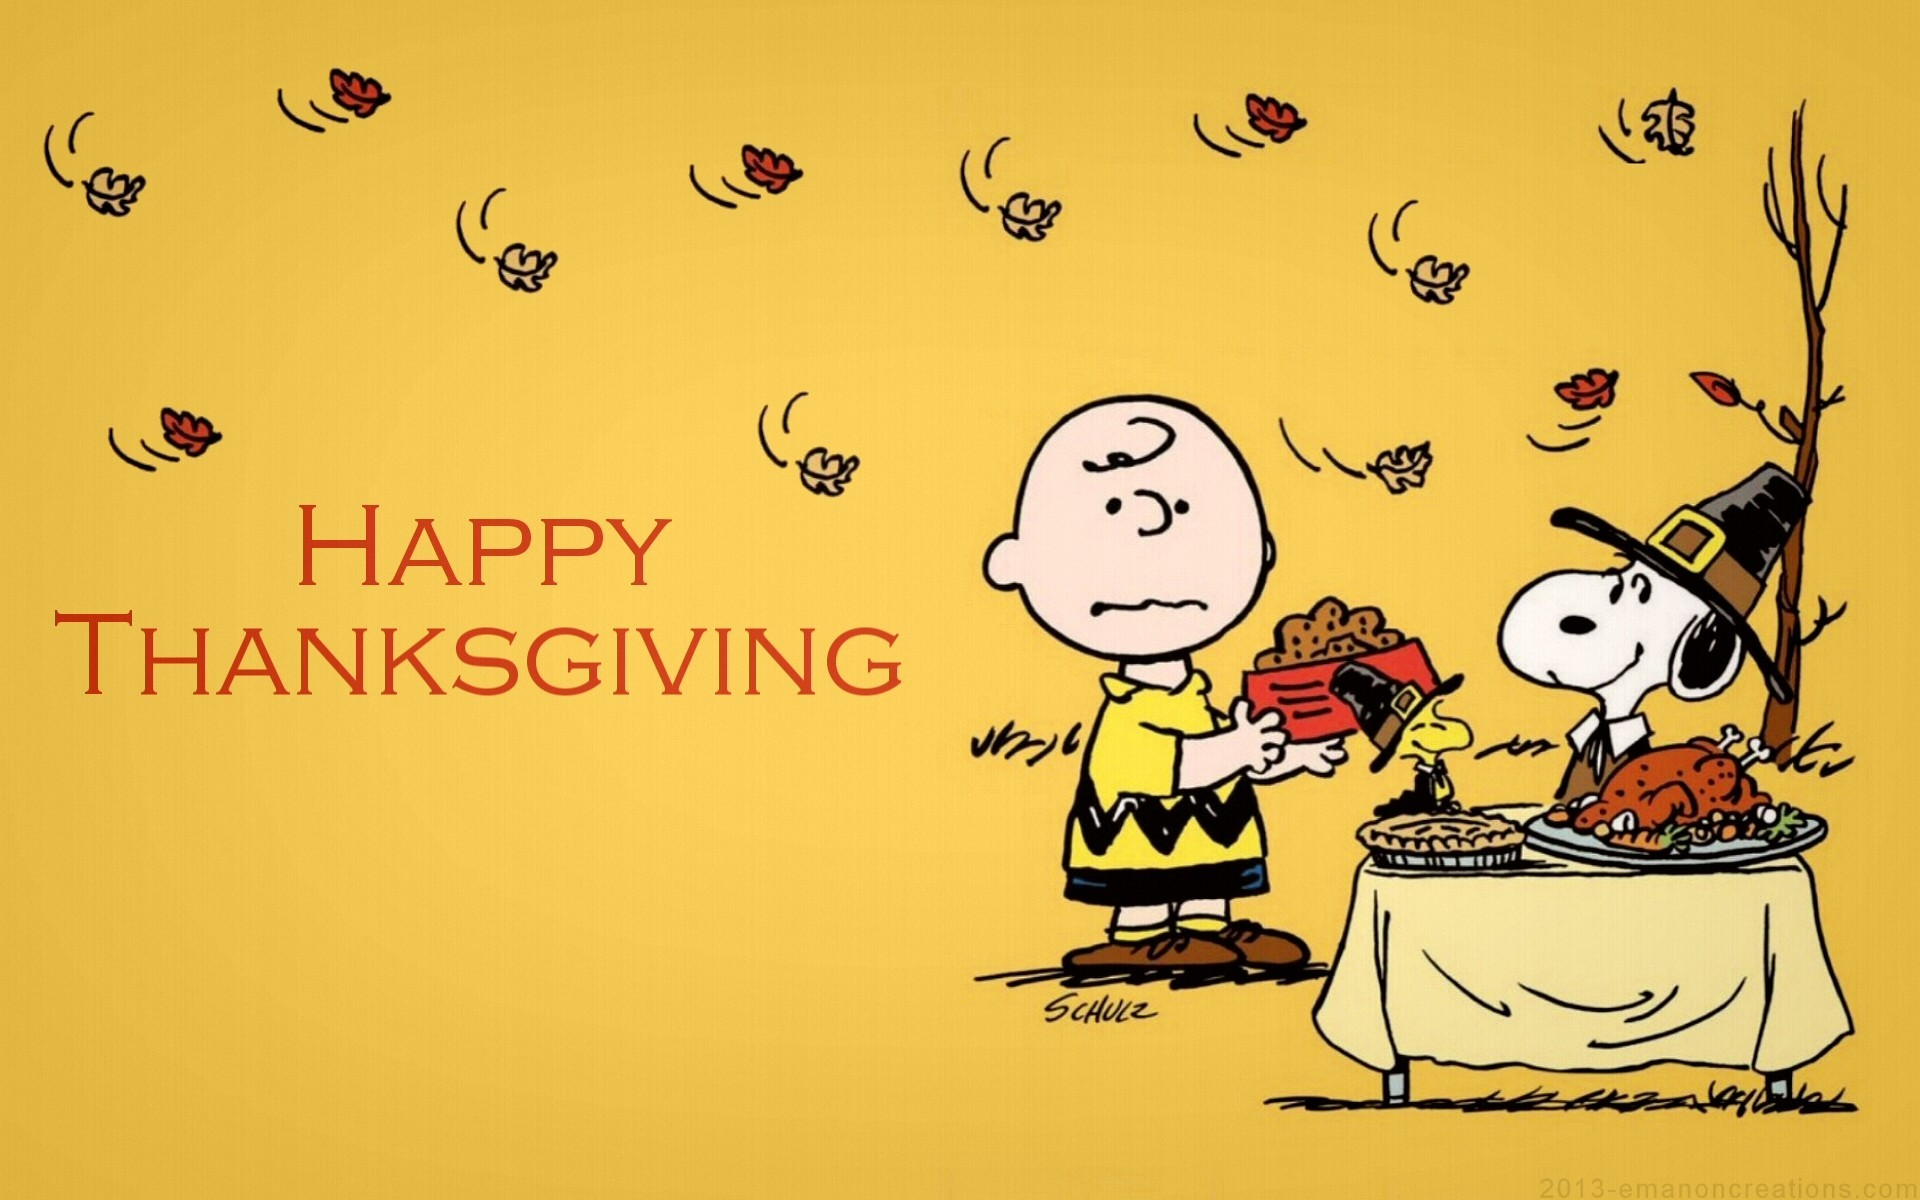 Backgrounds For 800 Disney Thanksgiving Wallpaper Backgrounds - Happy Thanksgiving Charlie Brown - HD Wallpaper